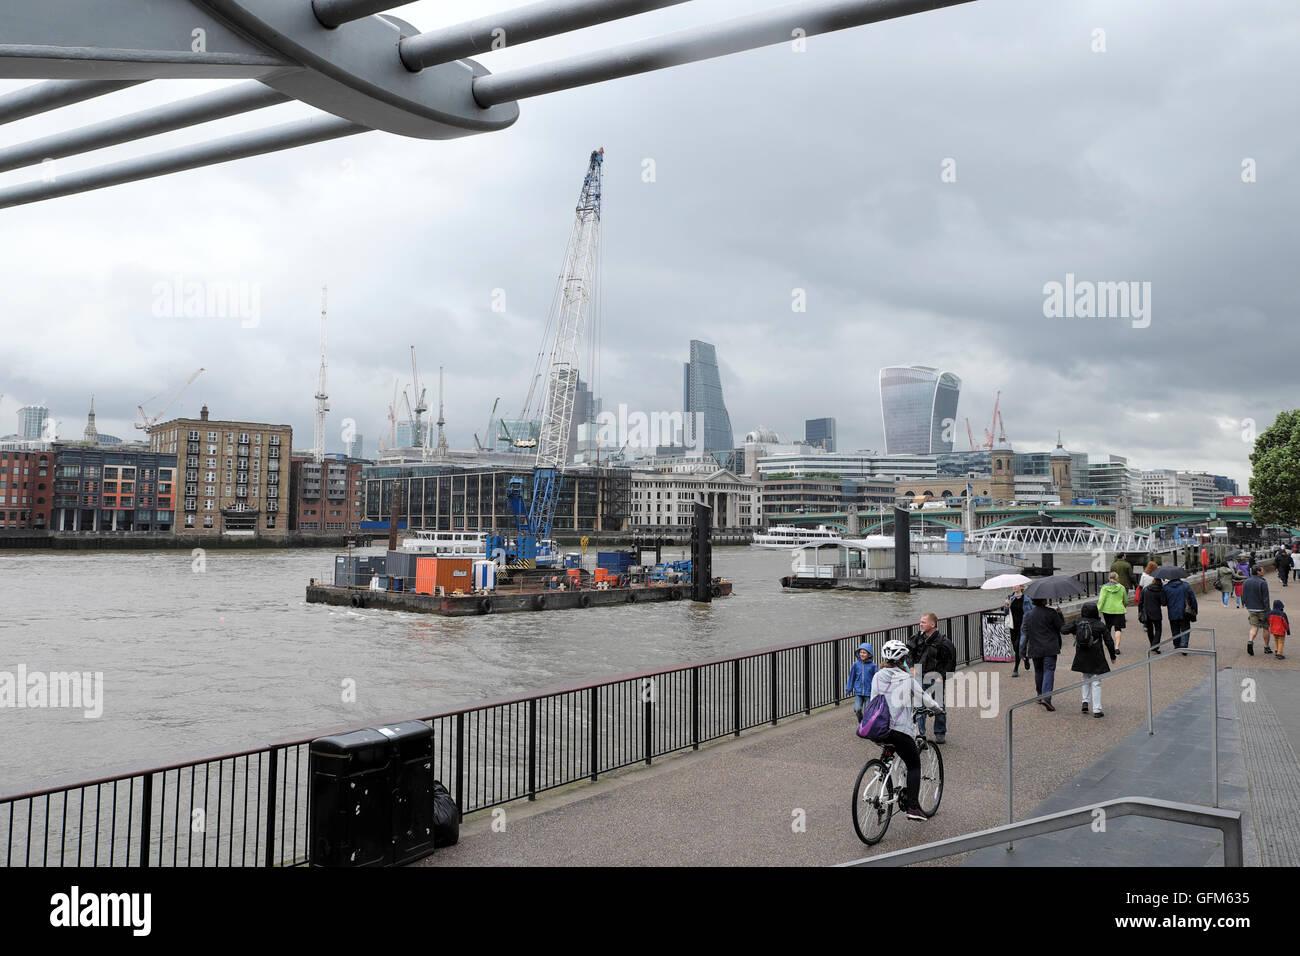 Cyclist and people walking barge on River Thames near Tate Modern Art Gallery & Millennium Bridge London UK   KATHY Stock Photo